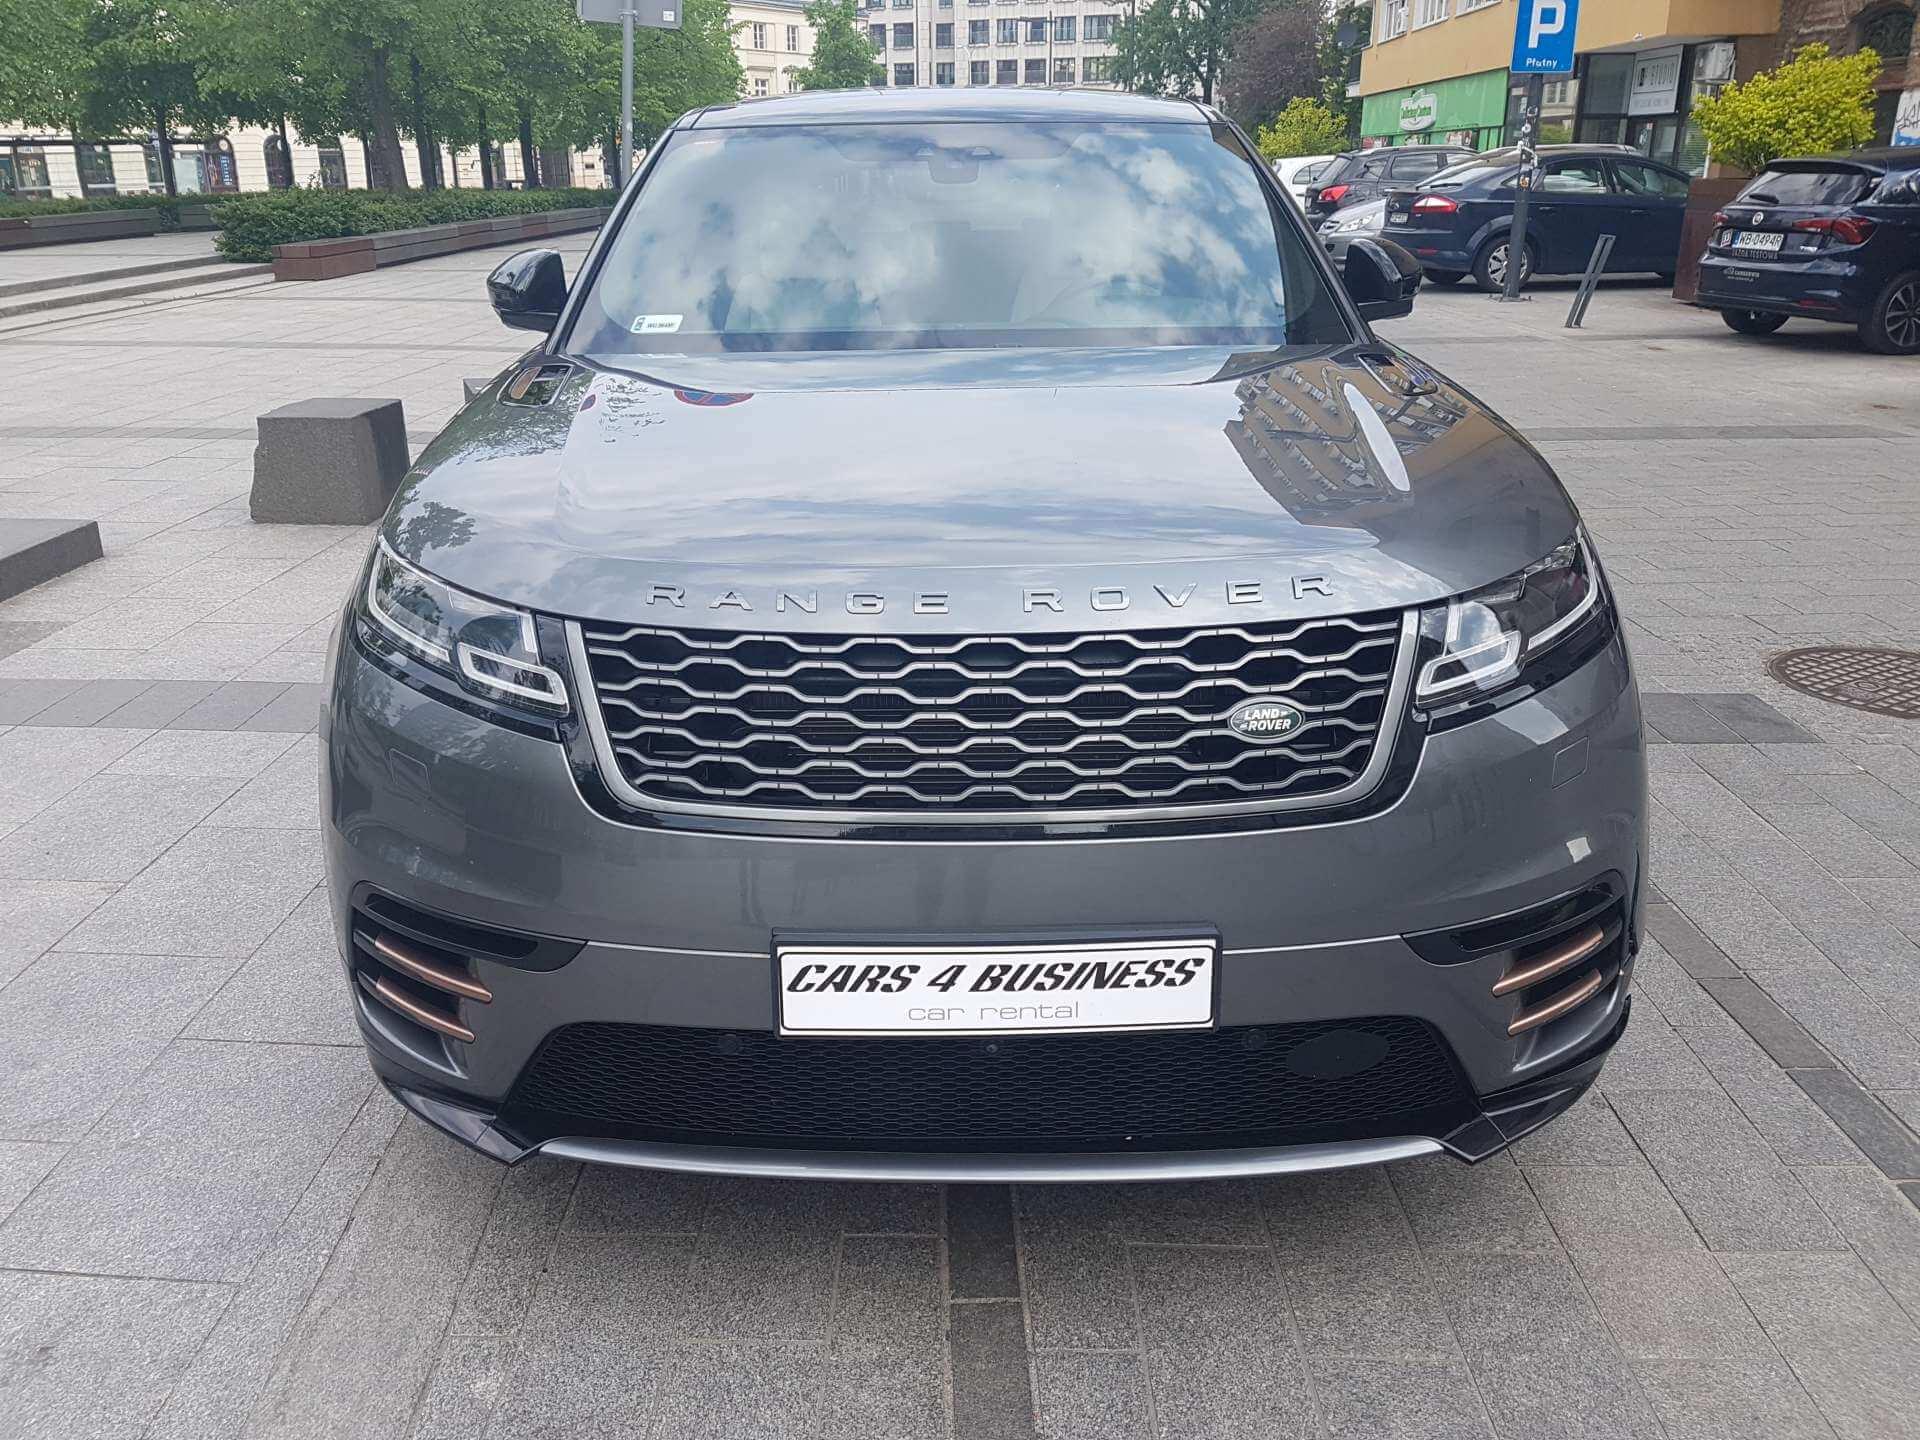 https://cars4business.pl/wp-content/uploads/2018/04/20180429_082807.jpg